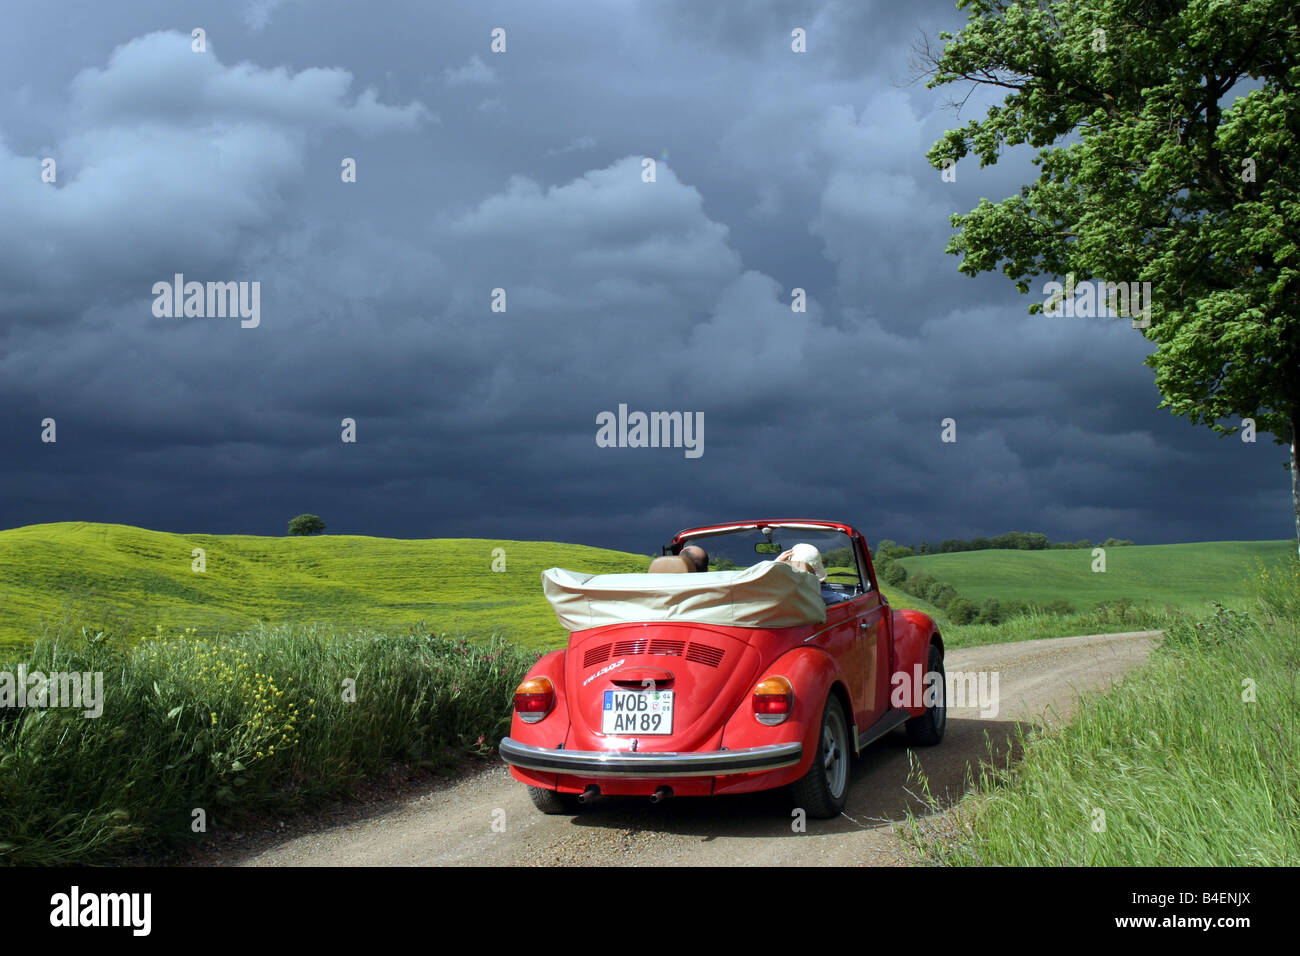 Car, VW, Volkswagen, Beetle Convertible, Red, Vintage Car, 1960s, Sixties,  1970s, Seventies, Convertible Top, Open, Driving, Dia